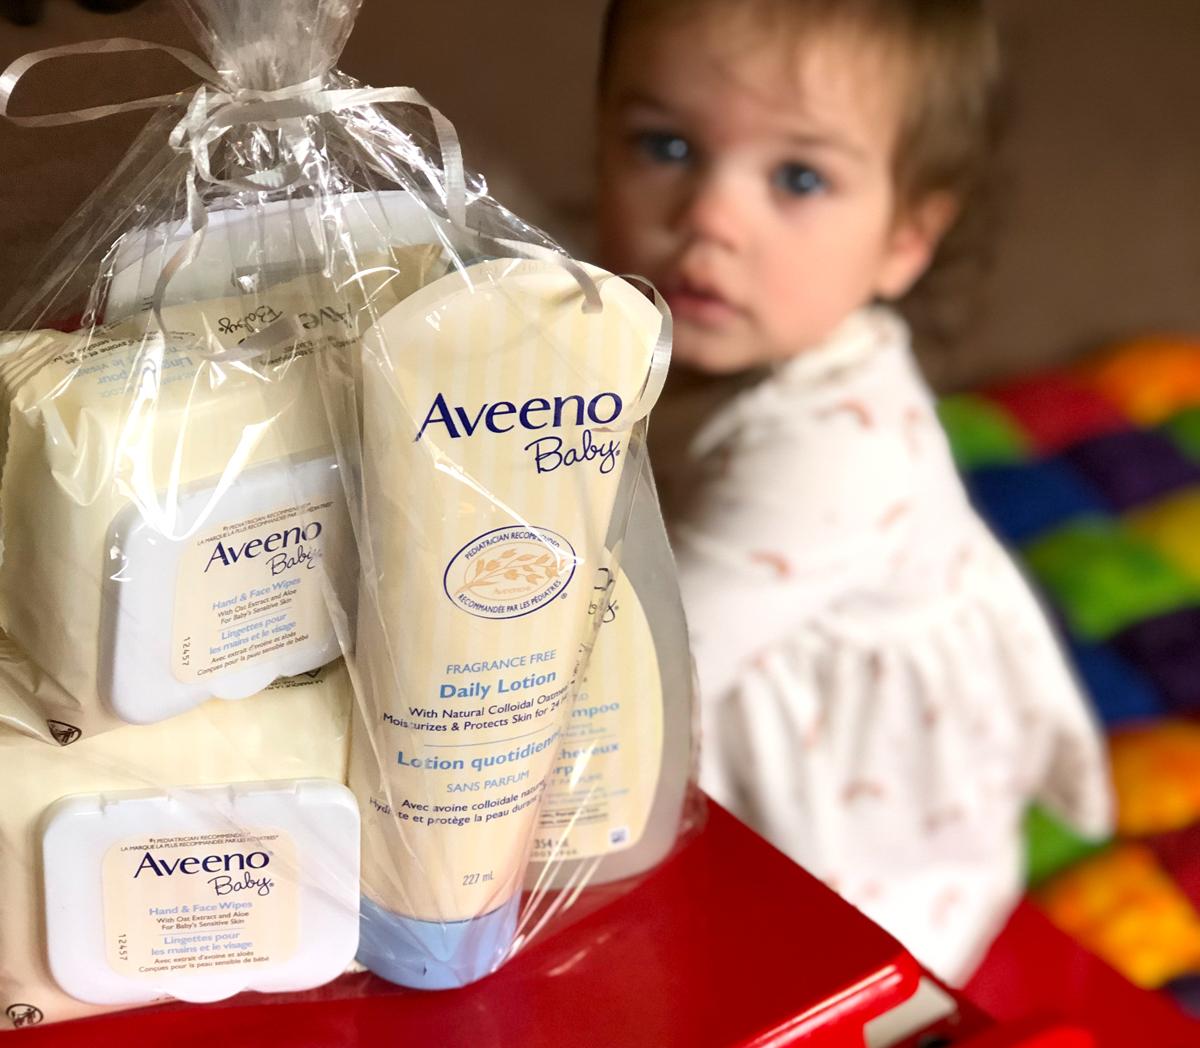 sensitive skin care tips for baby